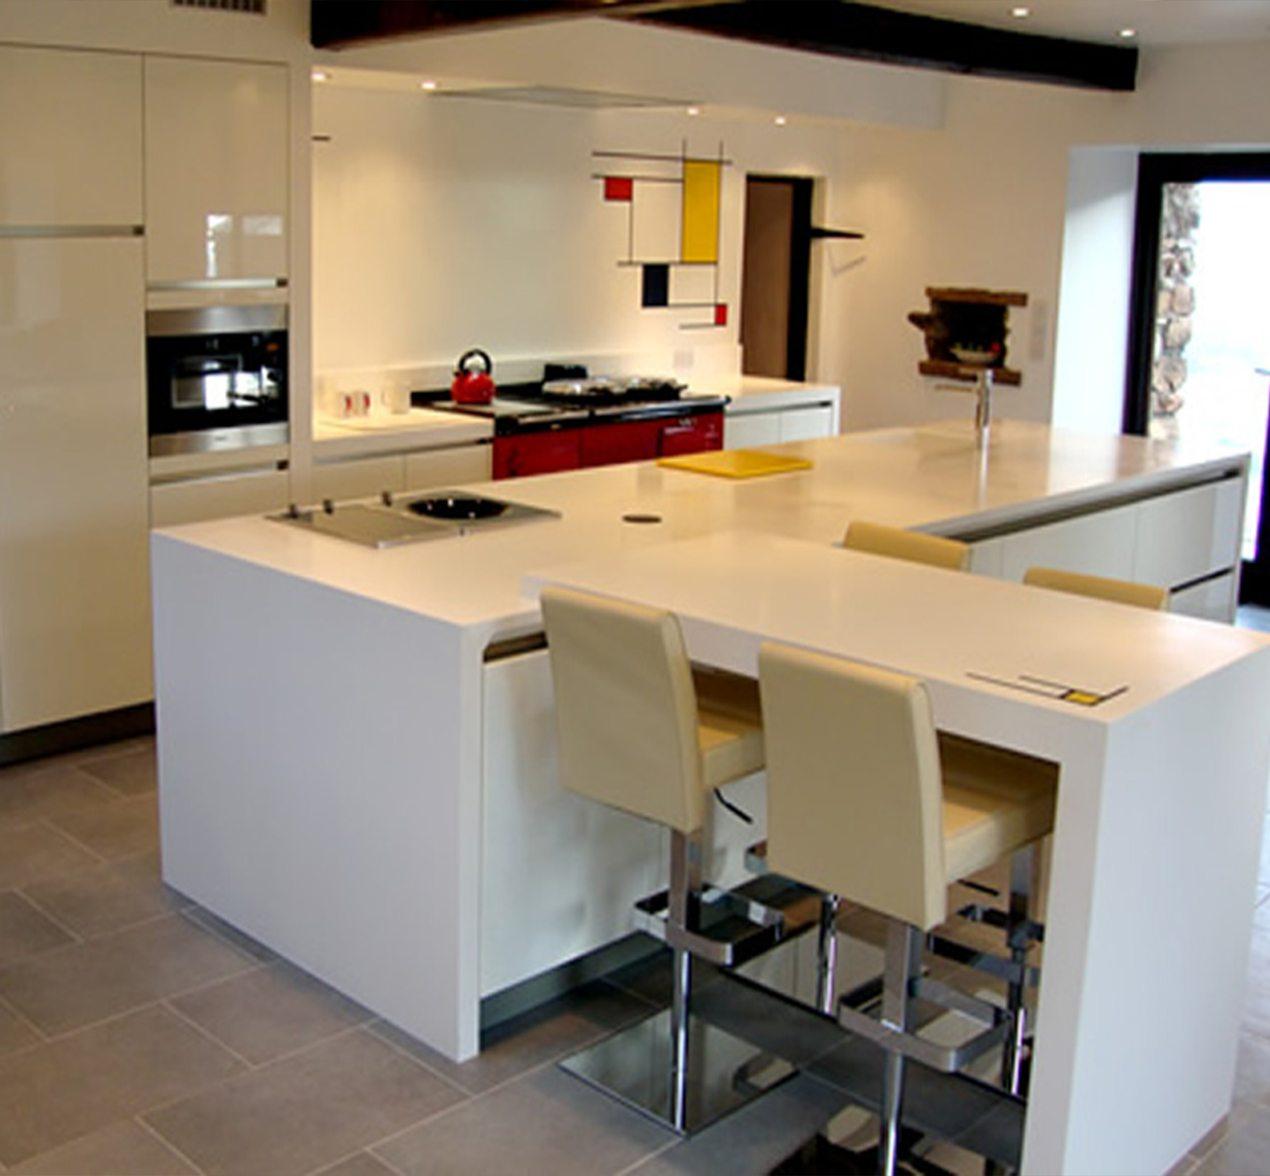 The Kitchen Design Centre: A Unique Kitchen Project In The Lake District Reinvents